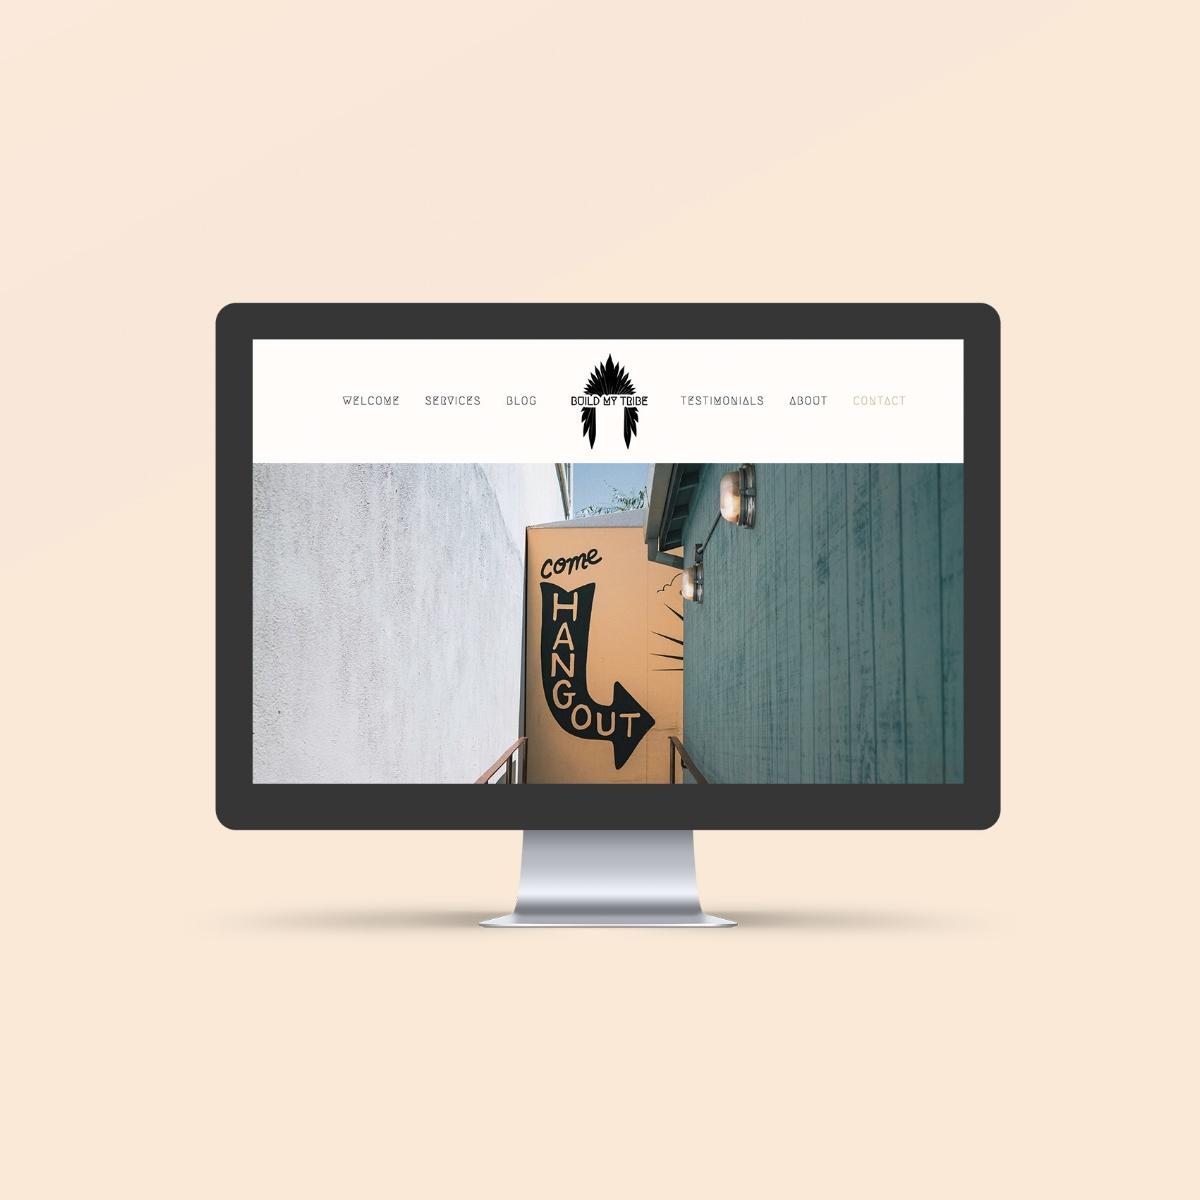 Ecommerce setup for Squarespace- Squarespace website